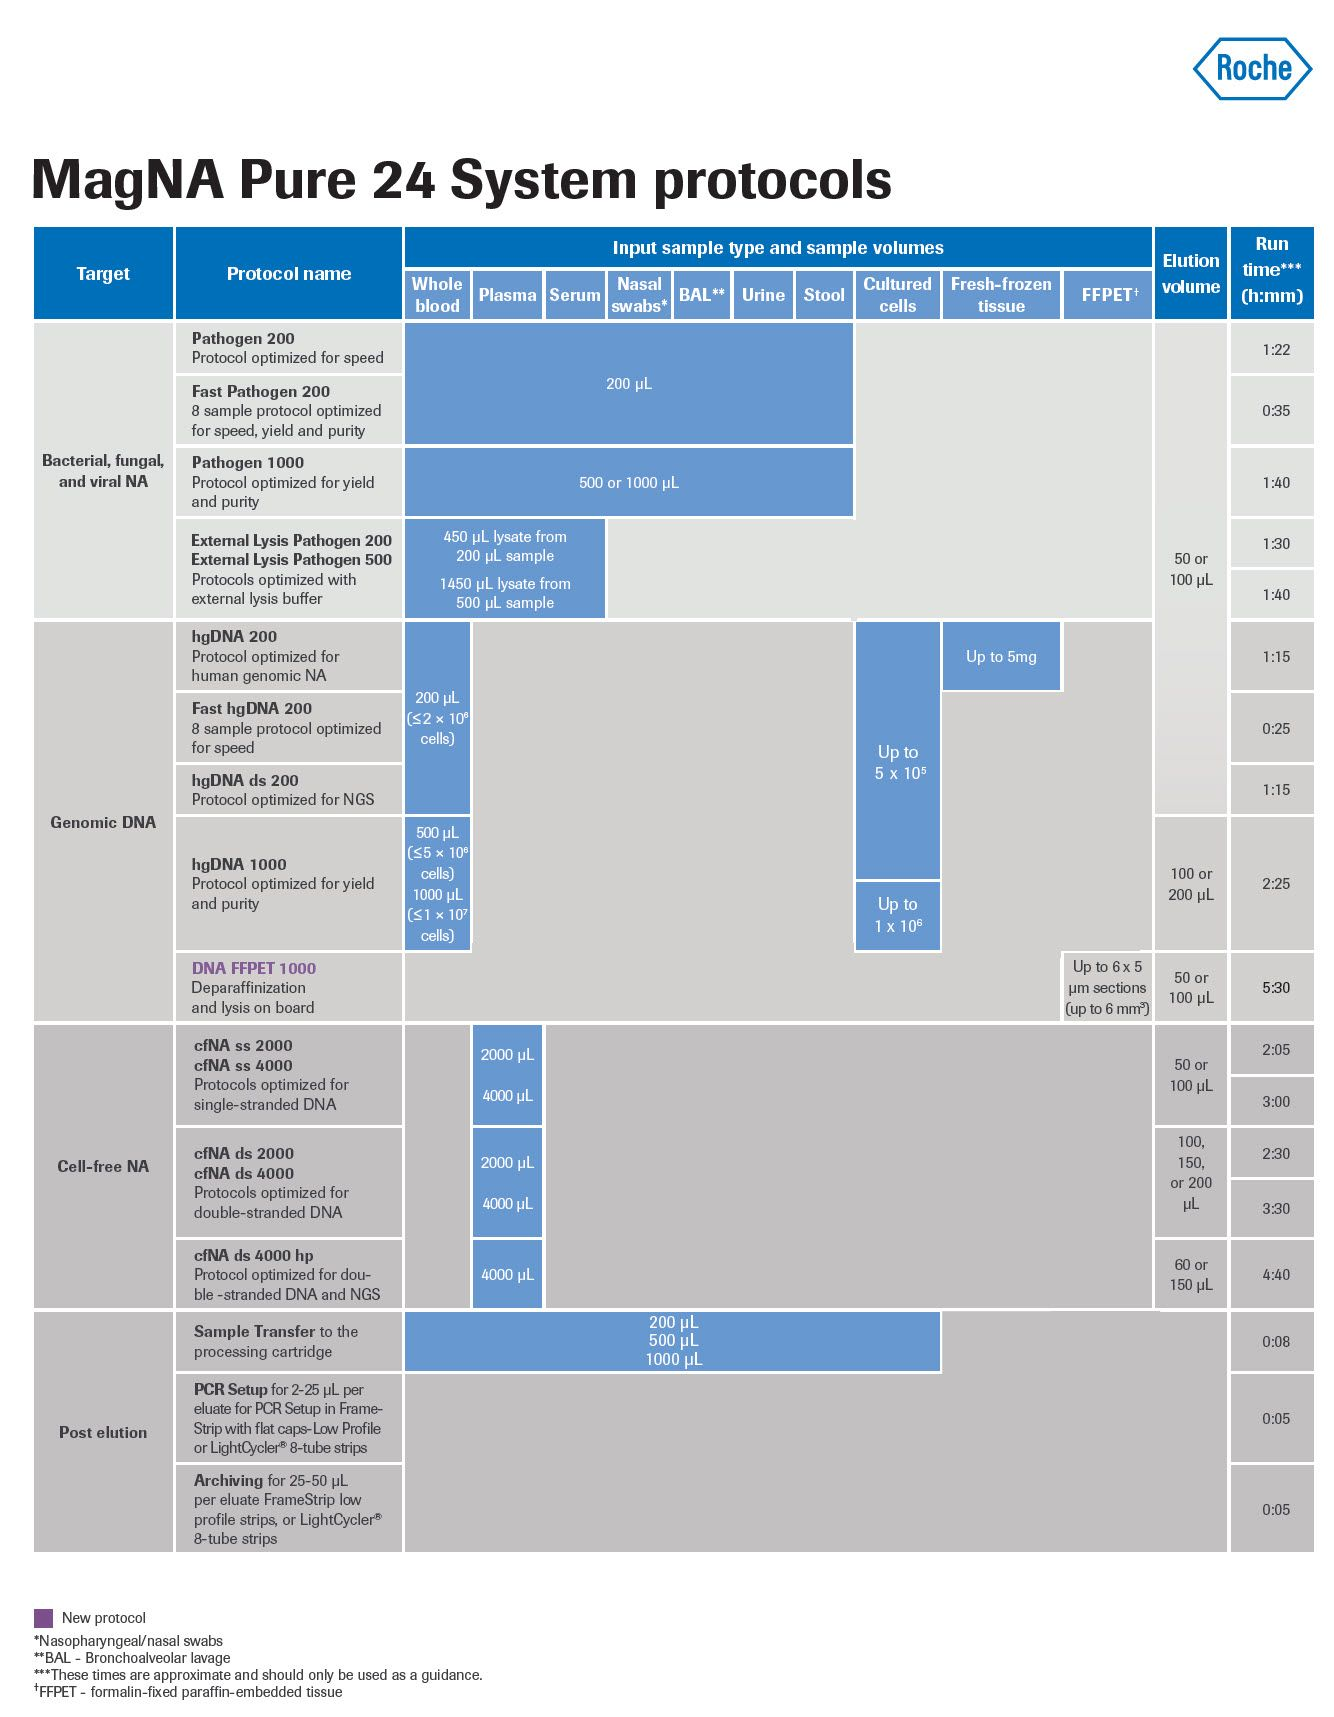 MagNa Pure 24 Chart